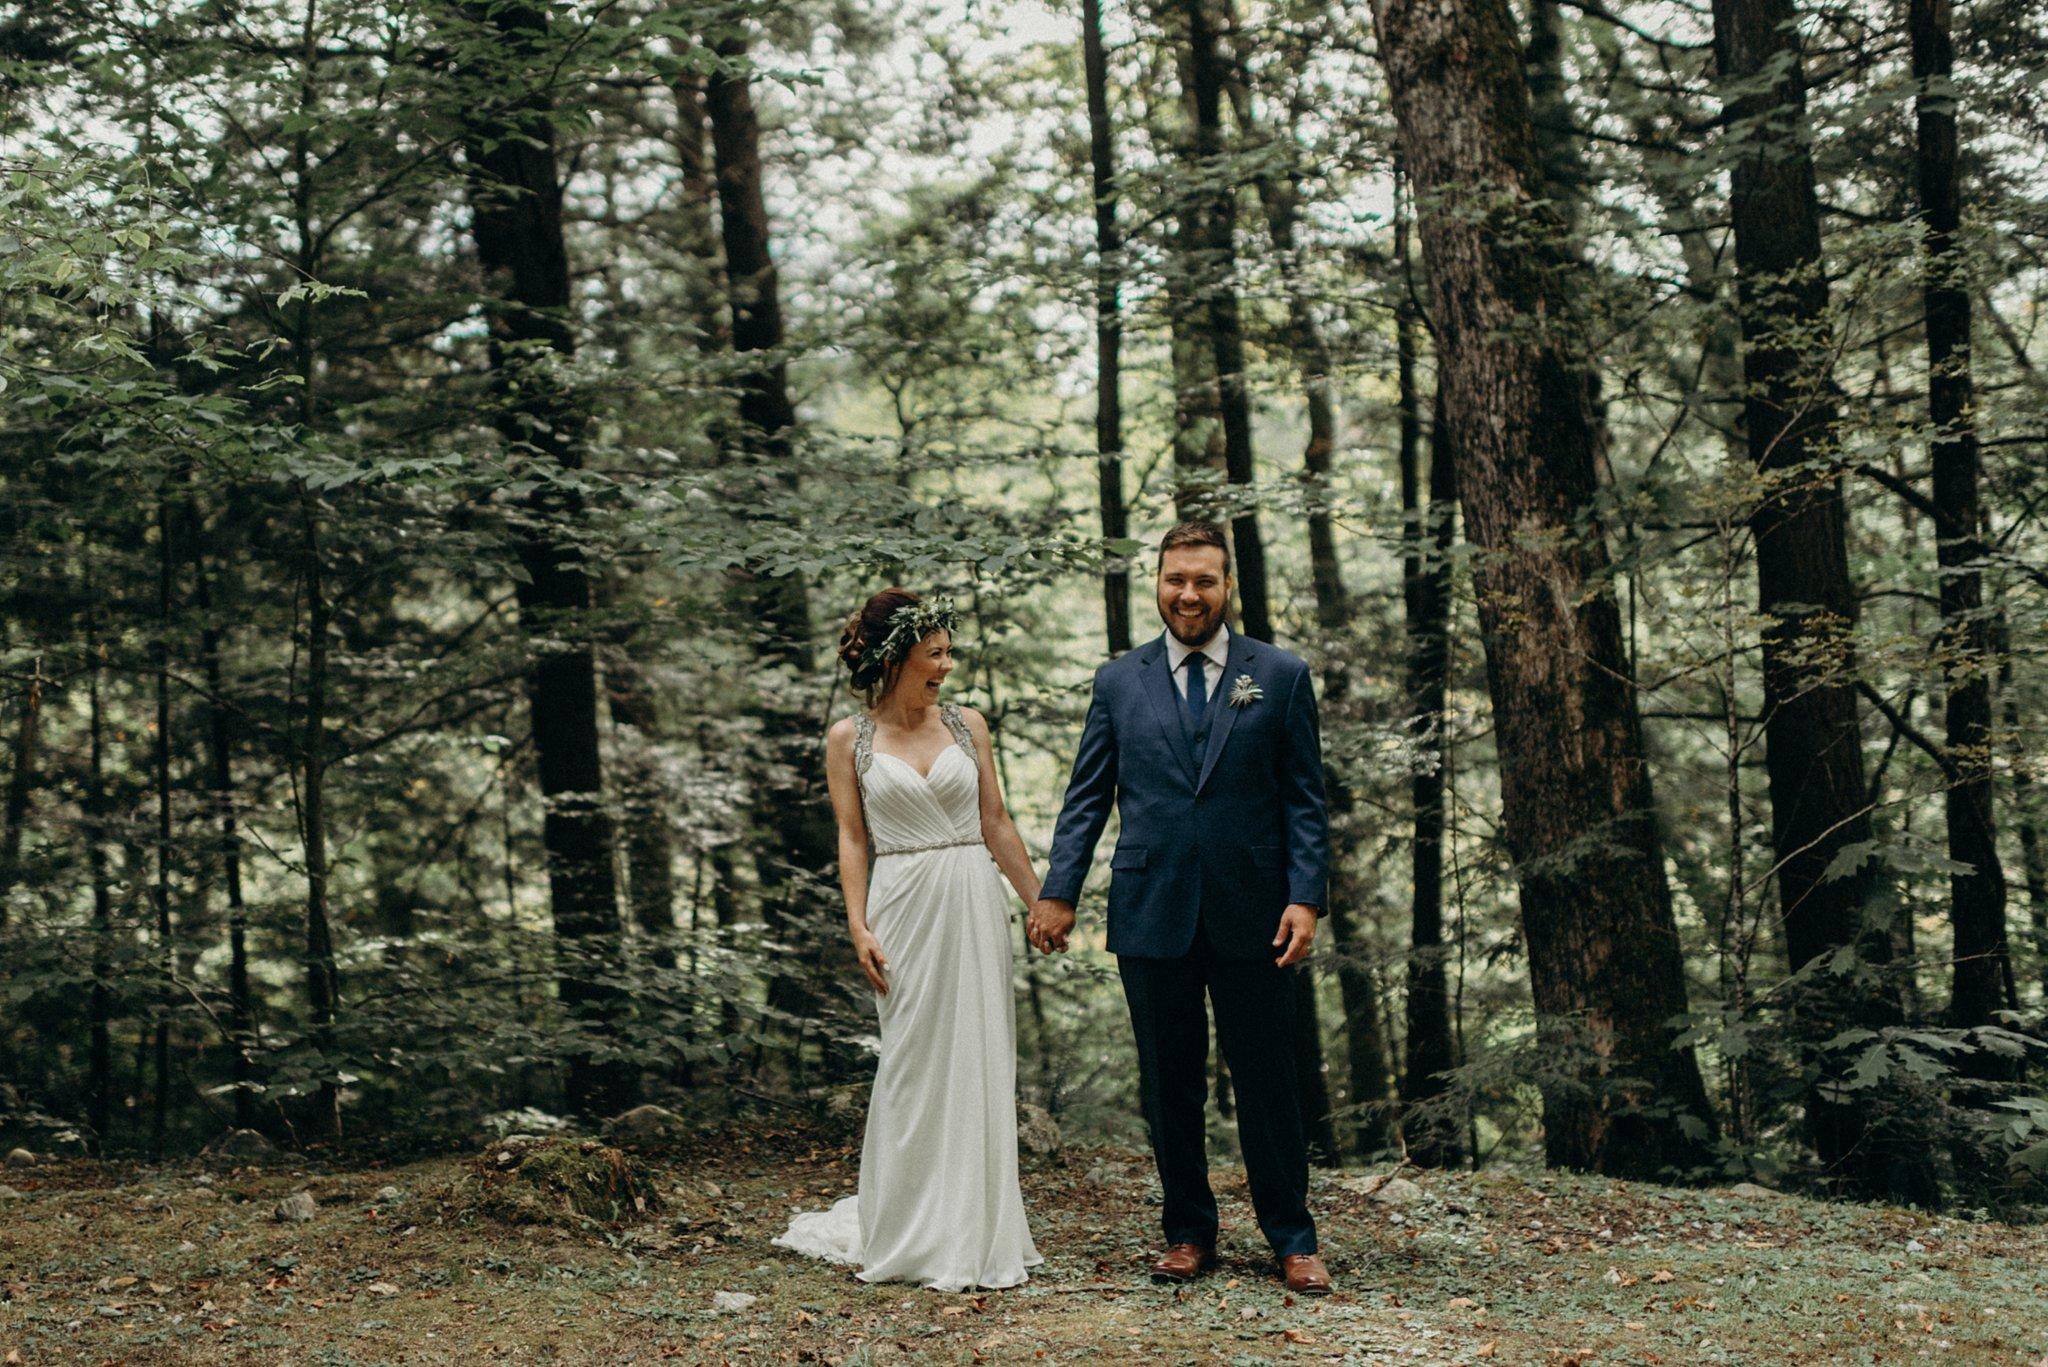 kaihla_tonai_intimate_wedding_elopement_photographer_6586.jpg